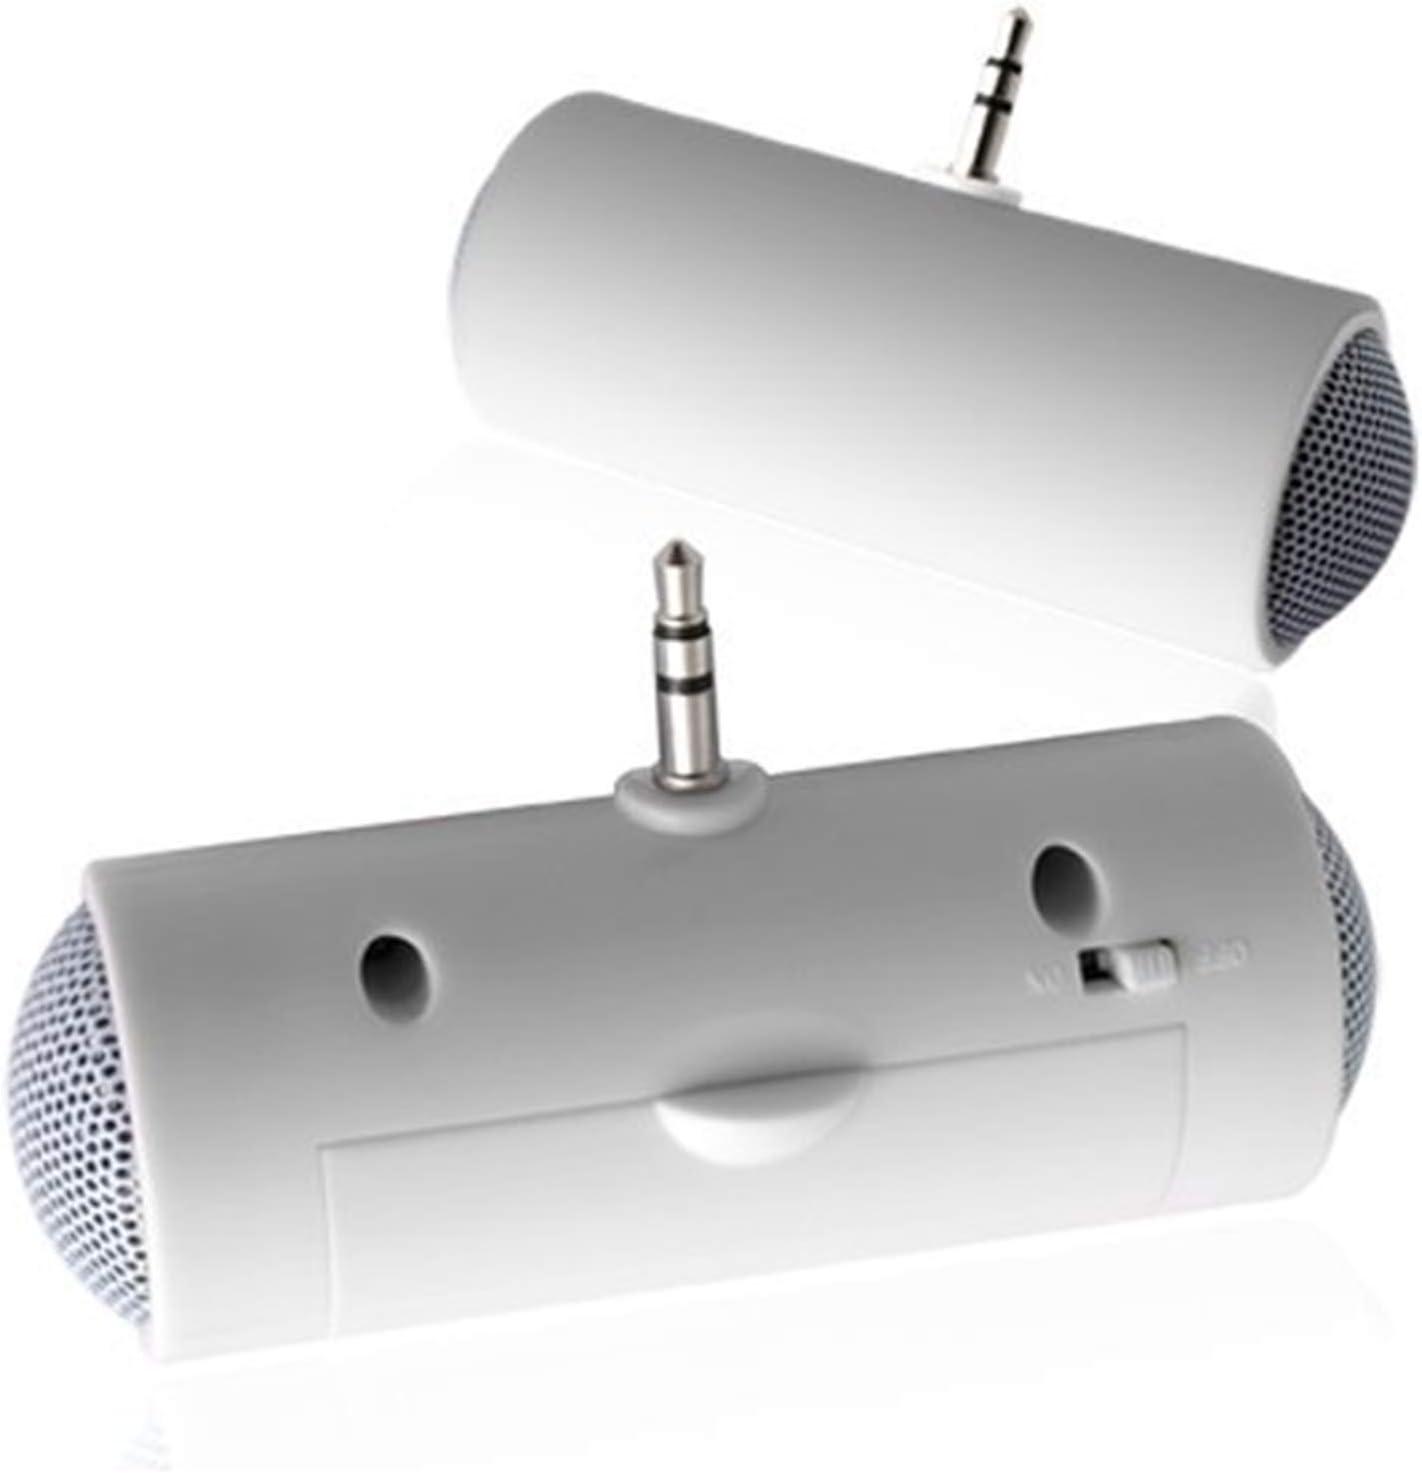 Wireless Cute Music Portable Bluetooth Speaker